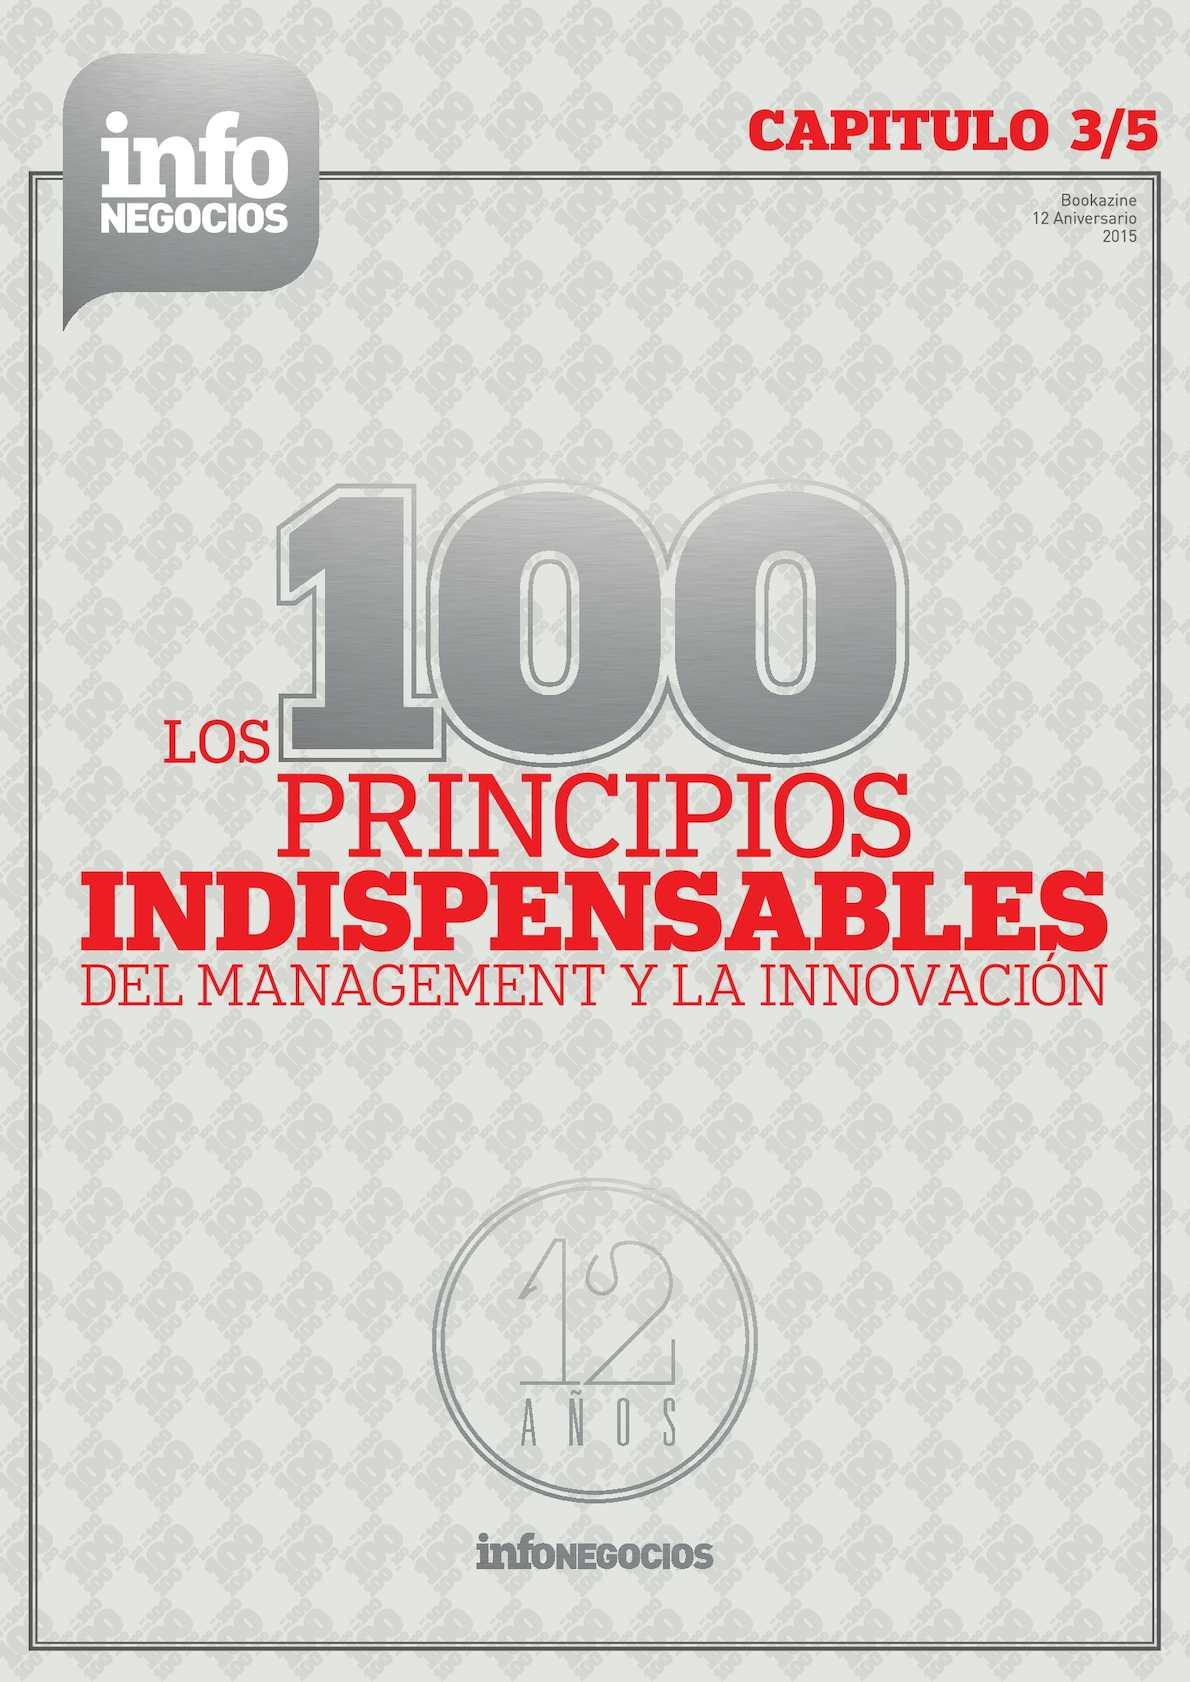 Las 100 P. del Management - 3 de 5